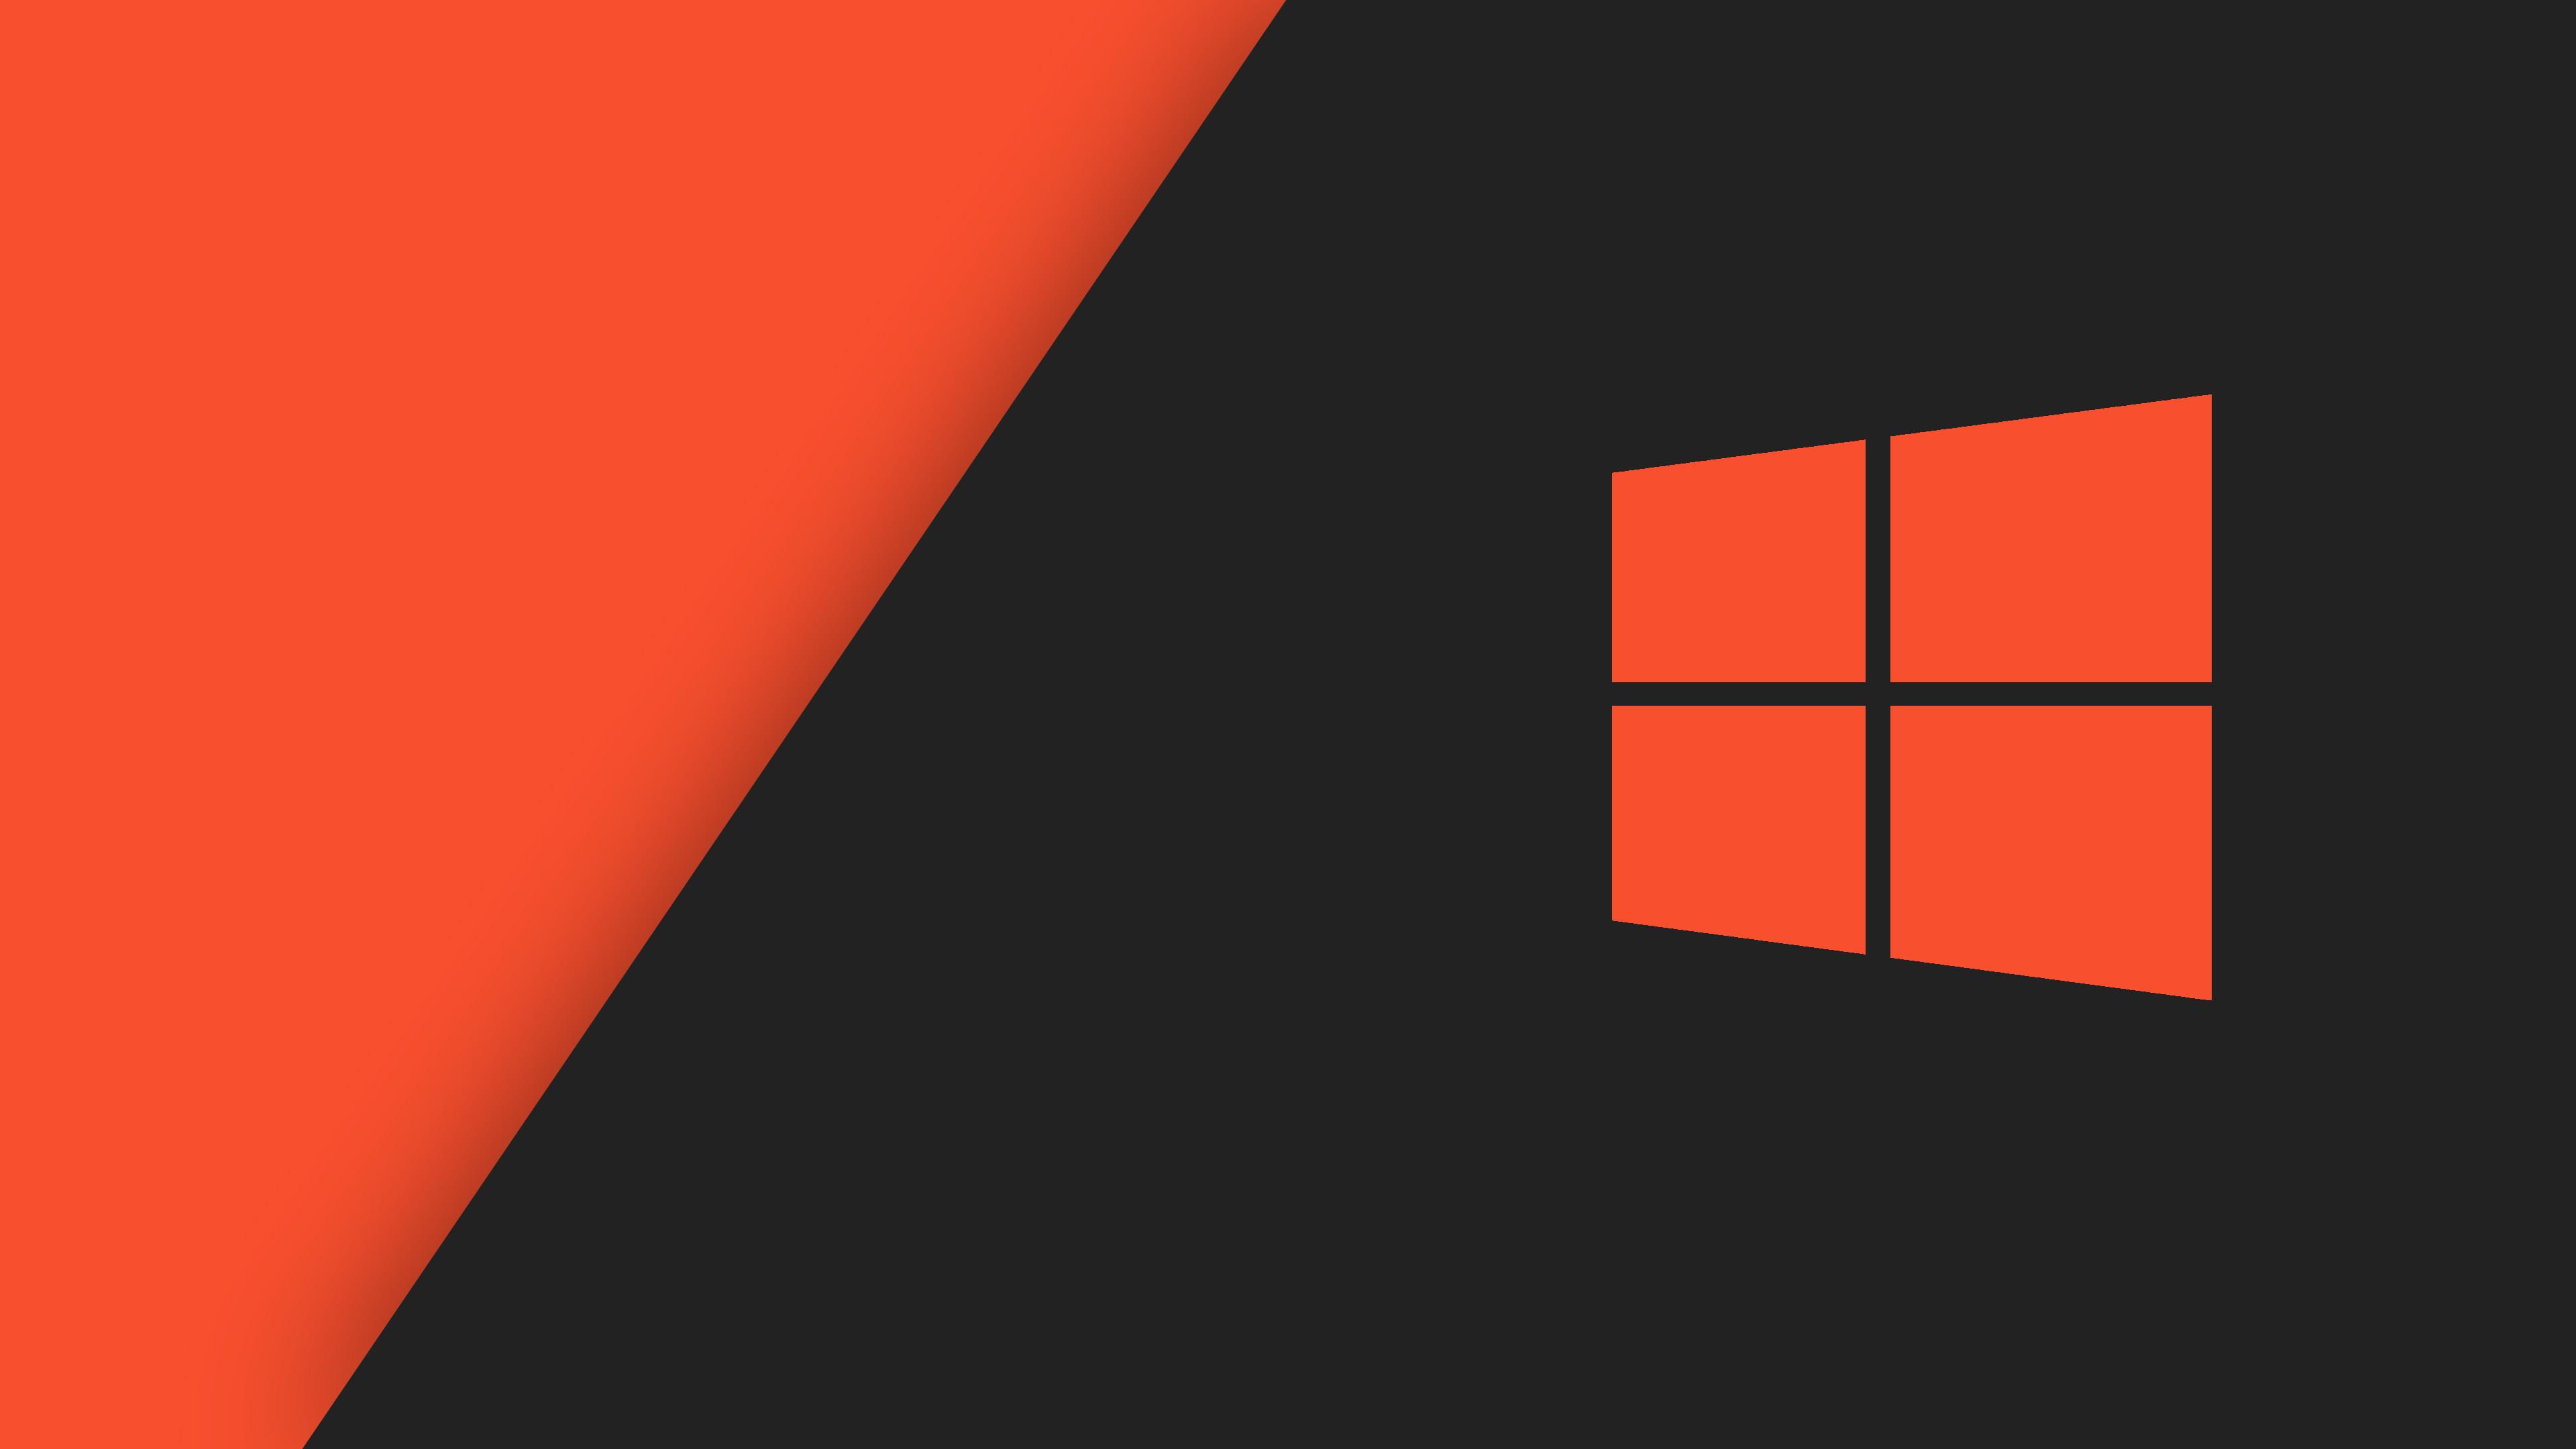 Best Microsoft Windows 10 Wallpaper Red Gray   View HD